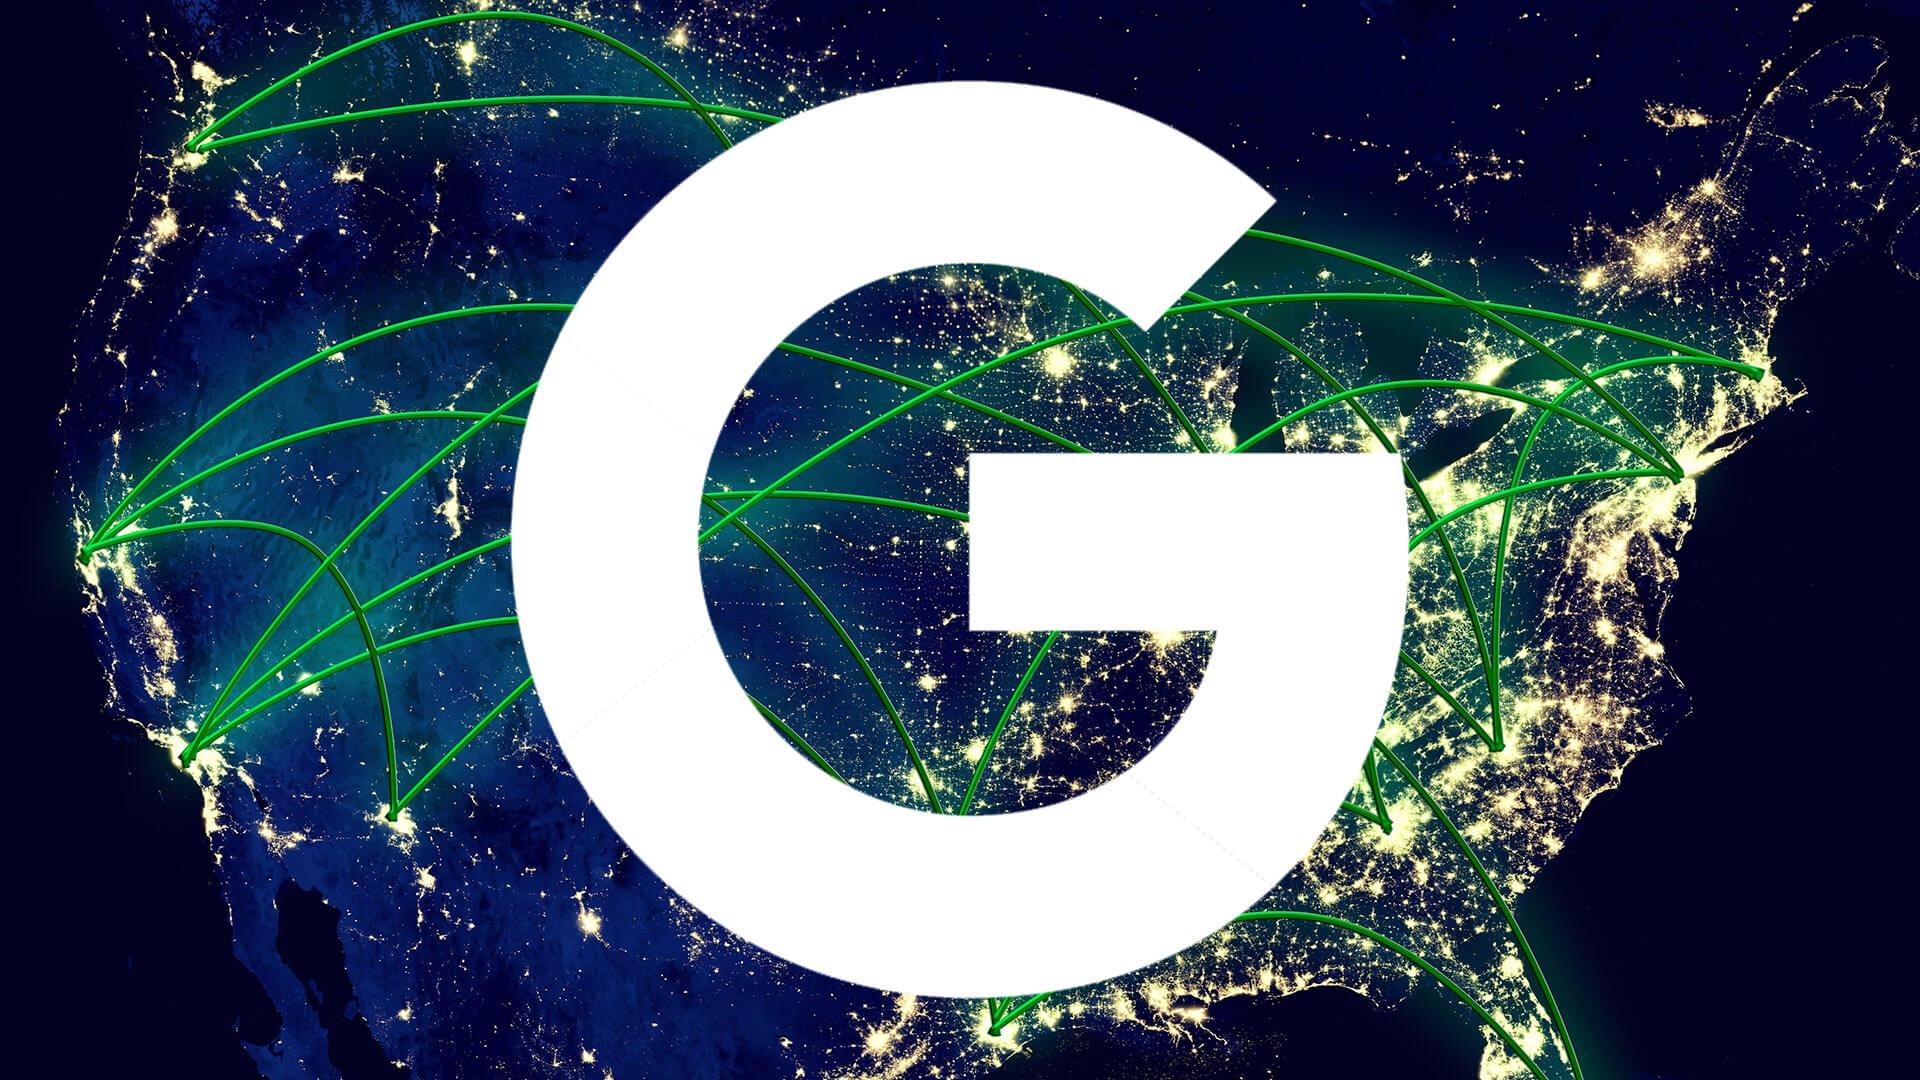 google-us-map1-ss-1920-1.jpg